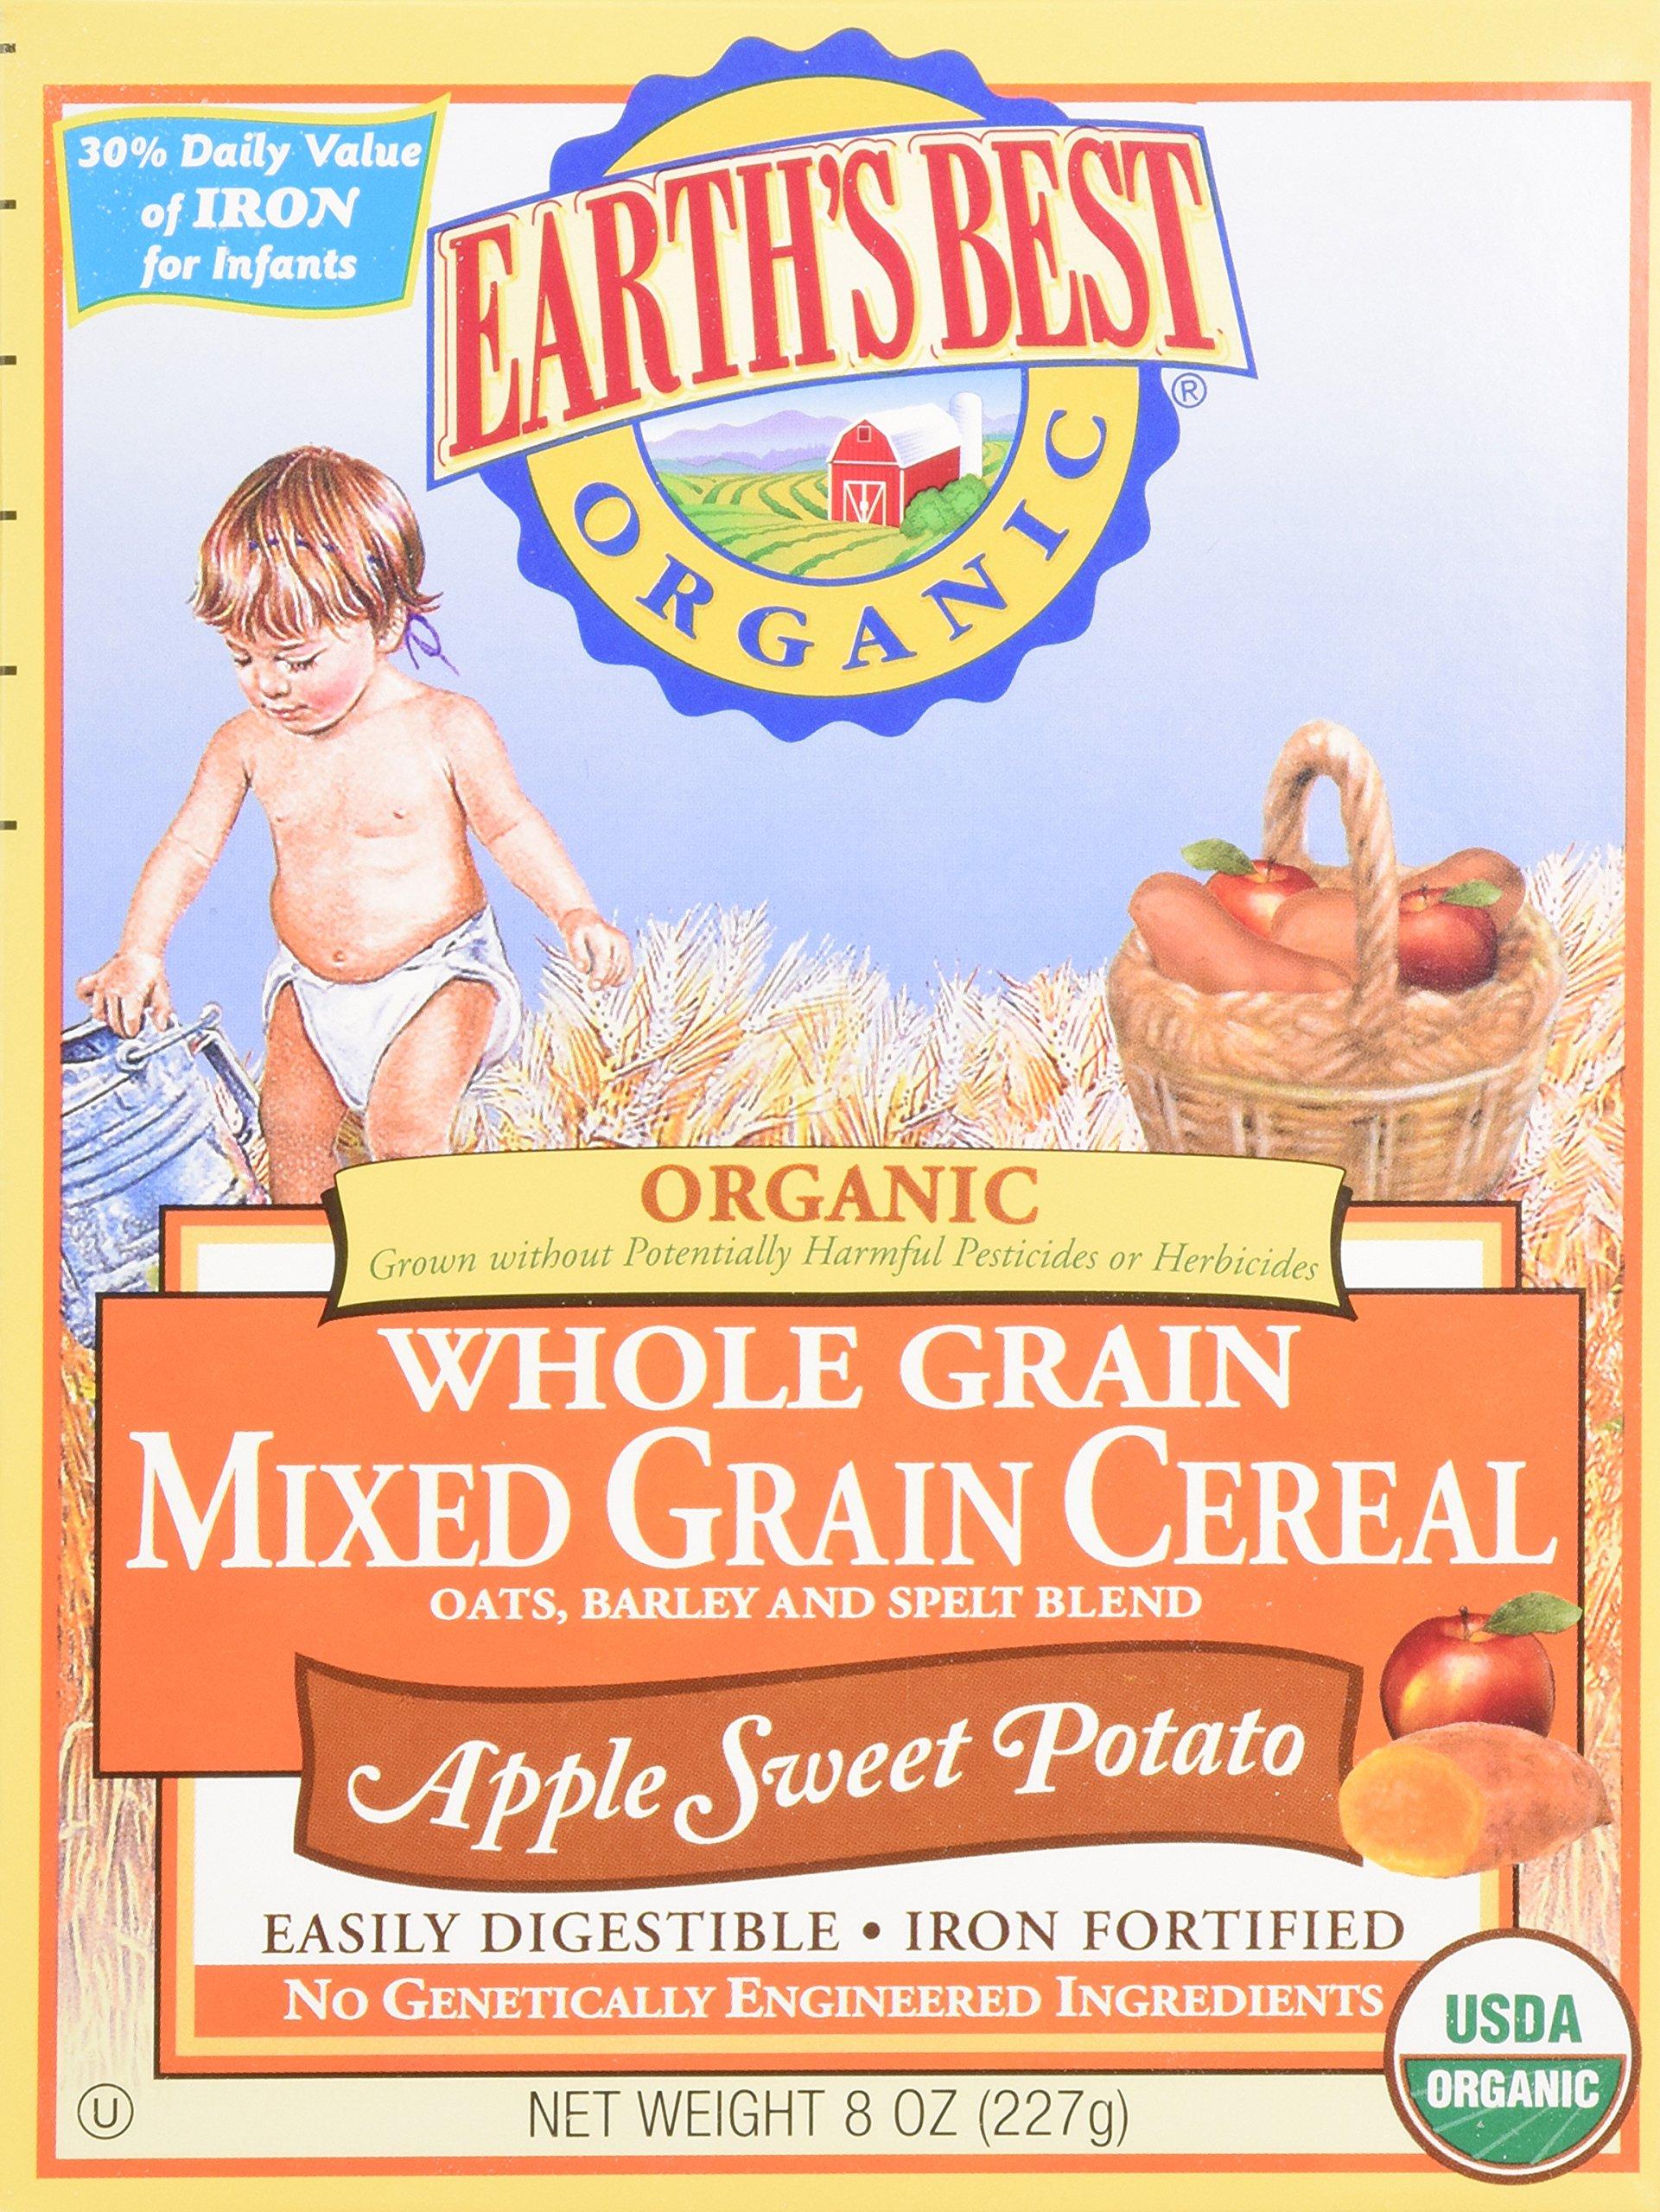 Earth's Best Whole Grain Mixed Grain Cereal Apple Sweet Potato - 8 oz.